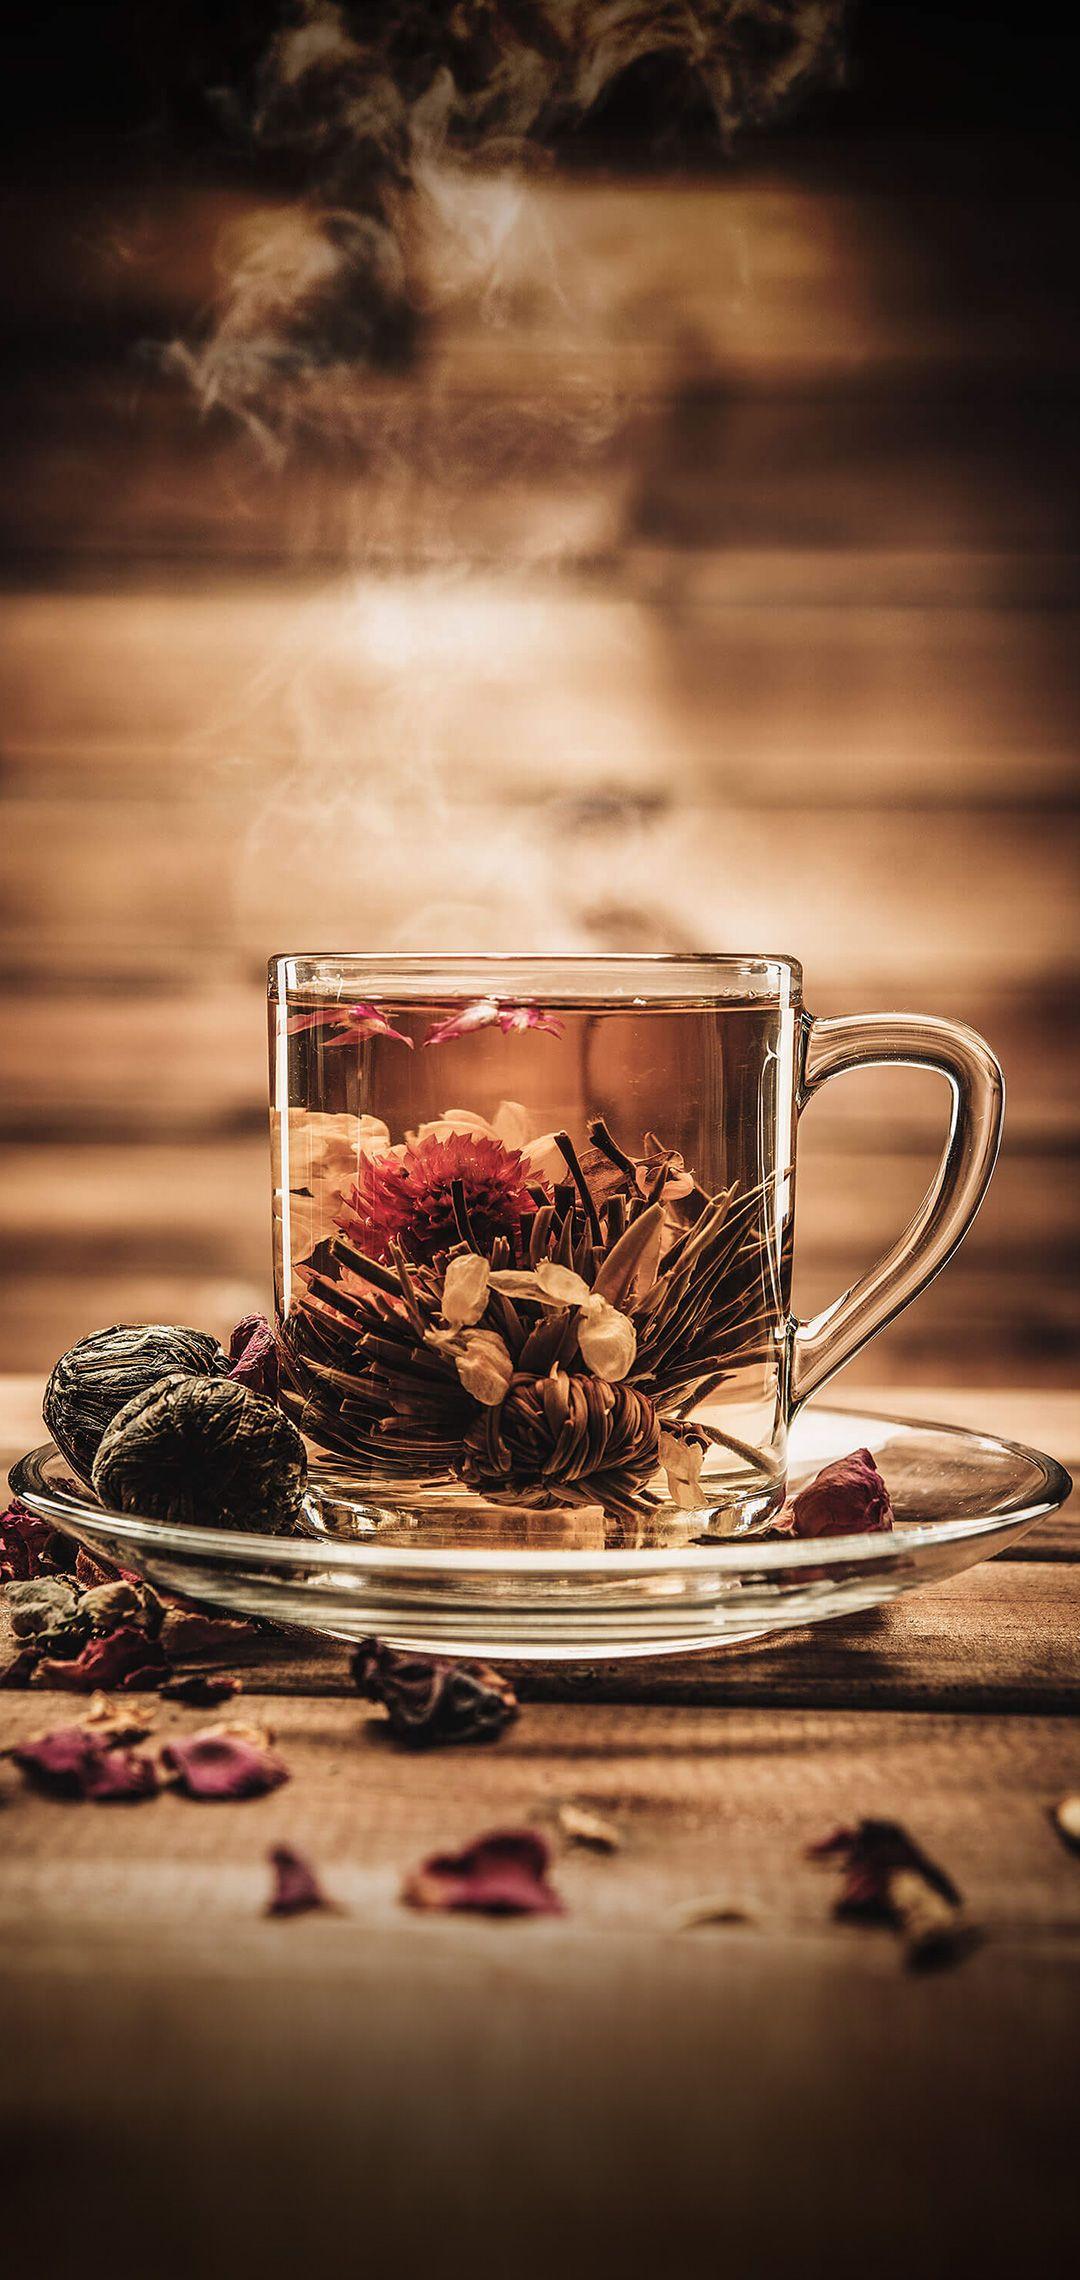 Mobile And Desktop Wallpaper Hd Blooming Tea Flower Tea Drinking Tea